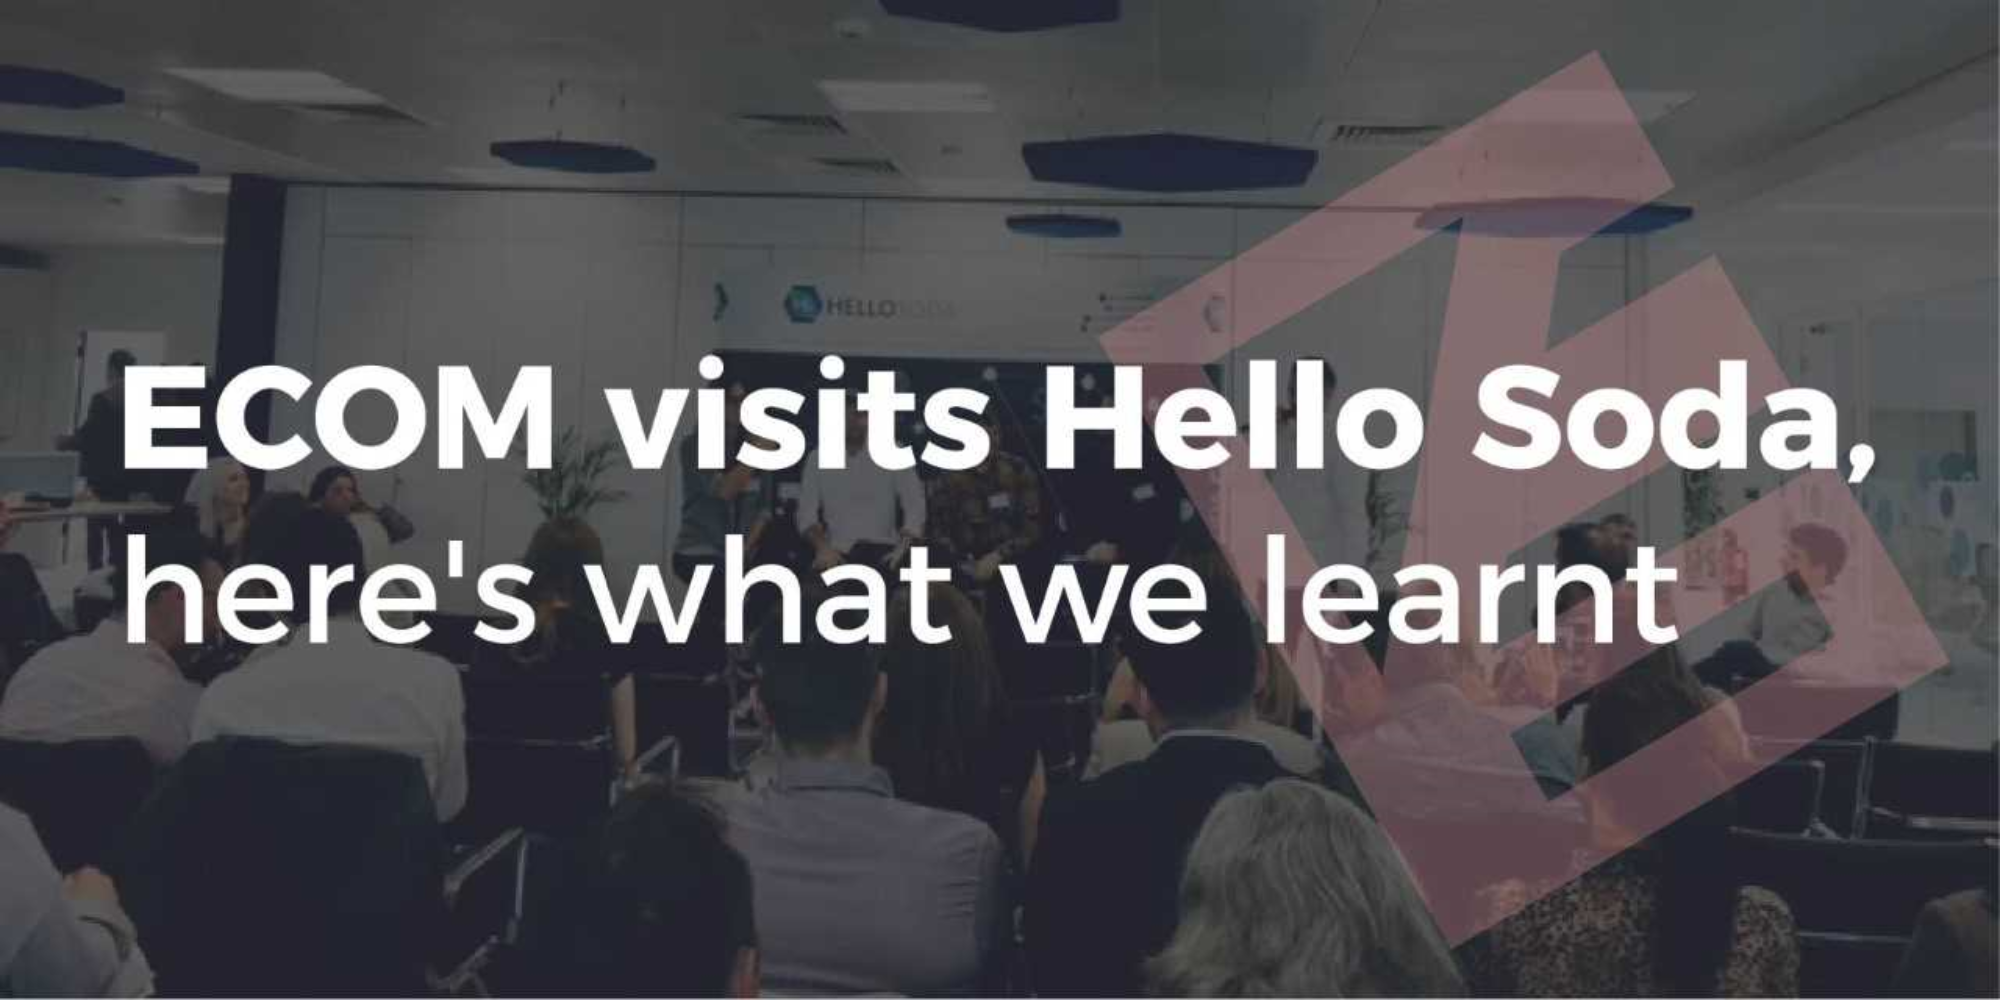 ECOM visits Hello Soda article banner